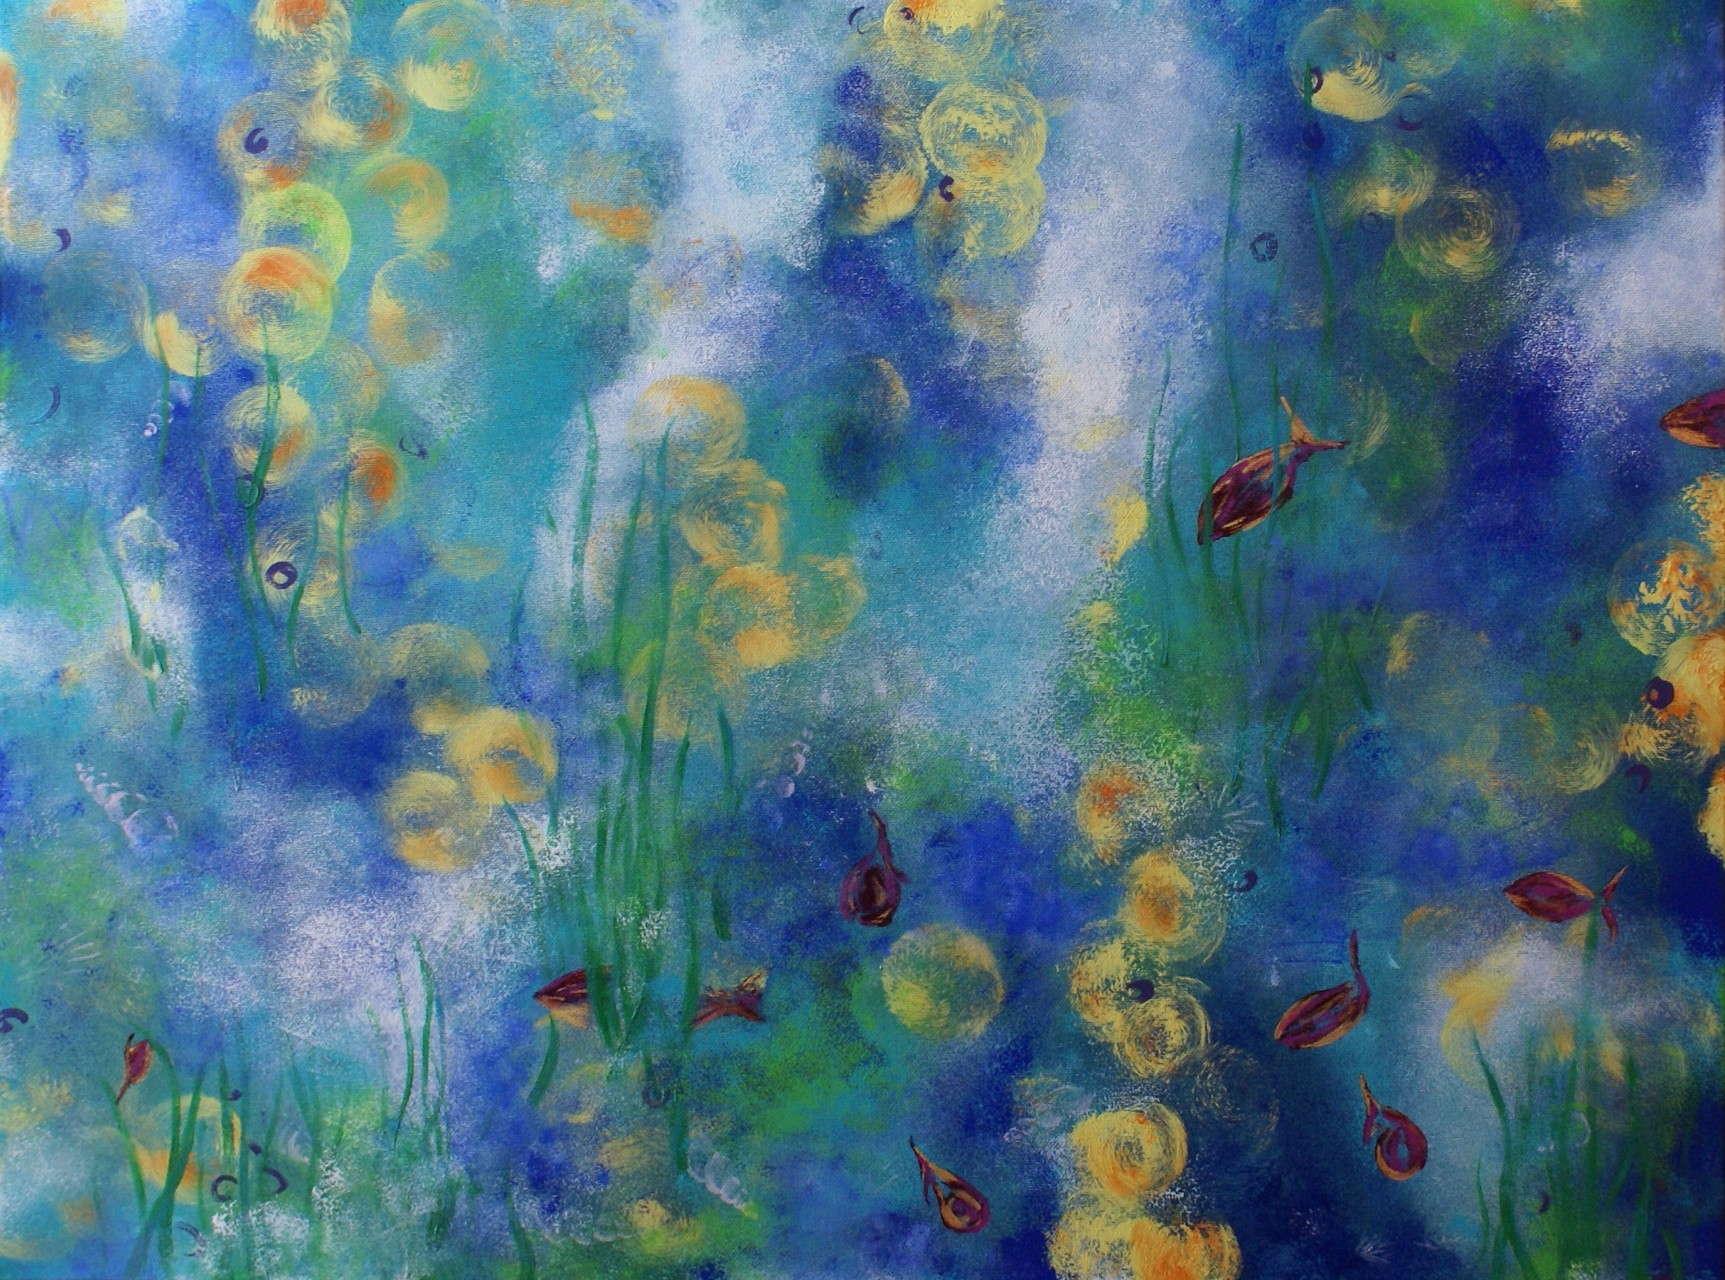 Wassermärchen - 60 x 80  - Acryl auf Leinwand